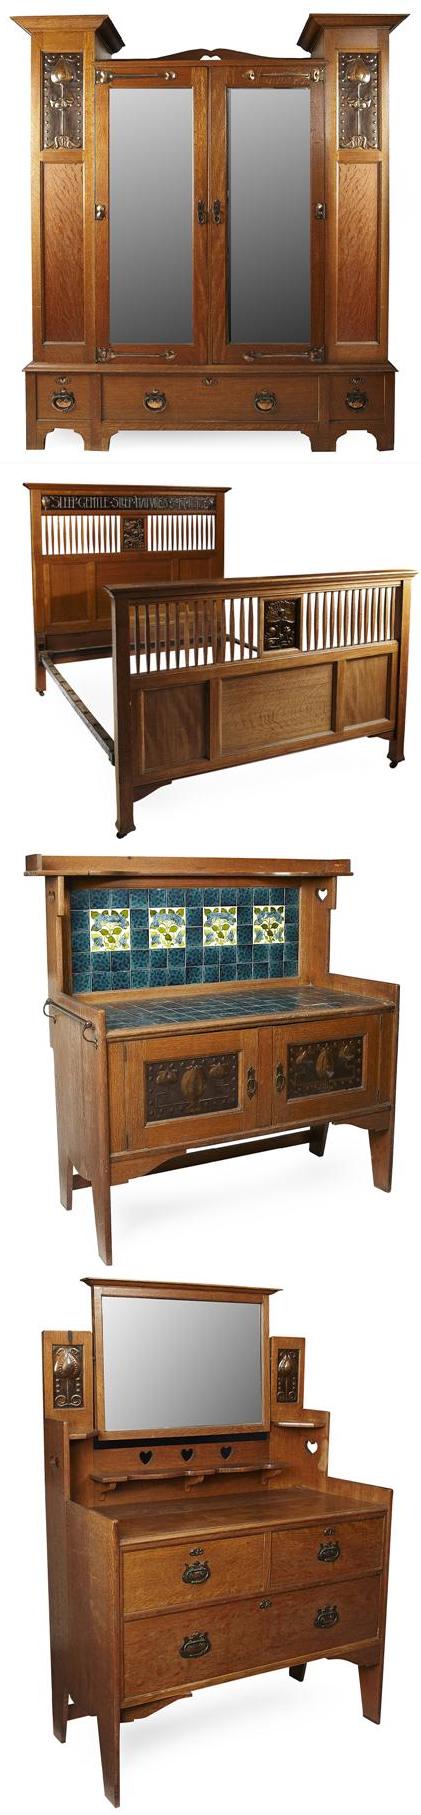 shapland petter barnstaple arts crafts oak and copper inlaid bedroom suite circa 1900. Black Bedroom Furniture Sets. Home Design Ideas